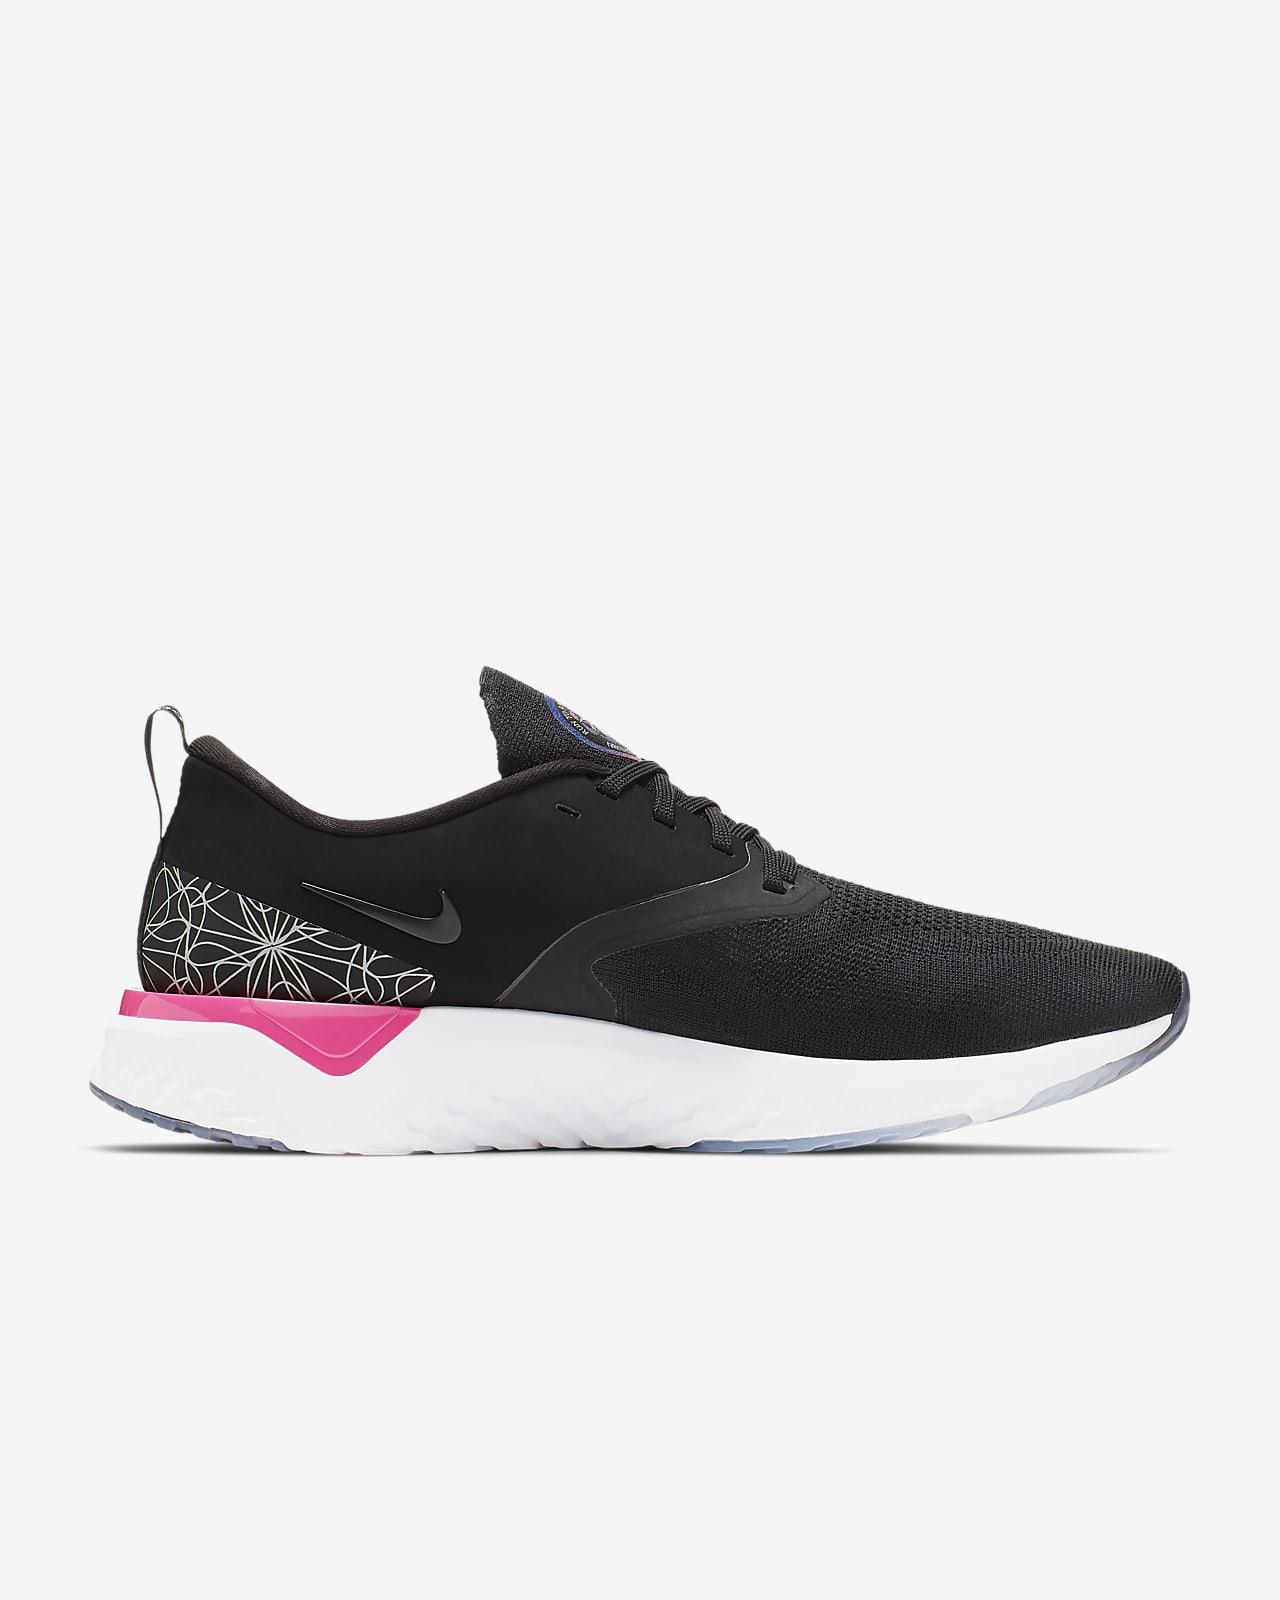 fin de semana Inaccesible exageración  Nike Odyssey React Flyknit 2 Men's Running Shoe. Nike GB